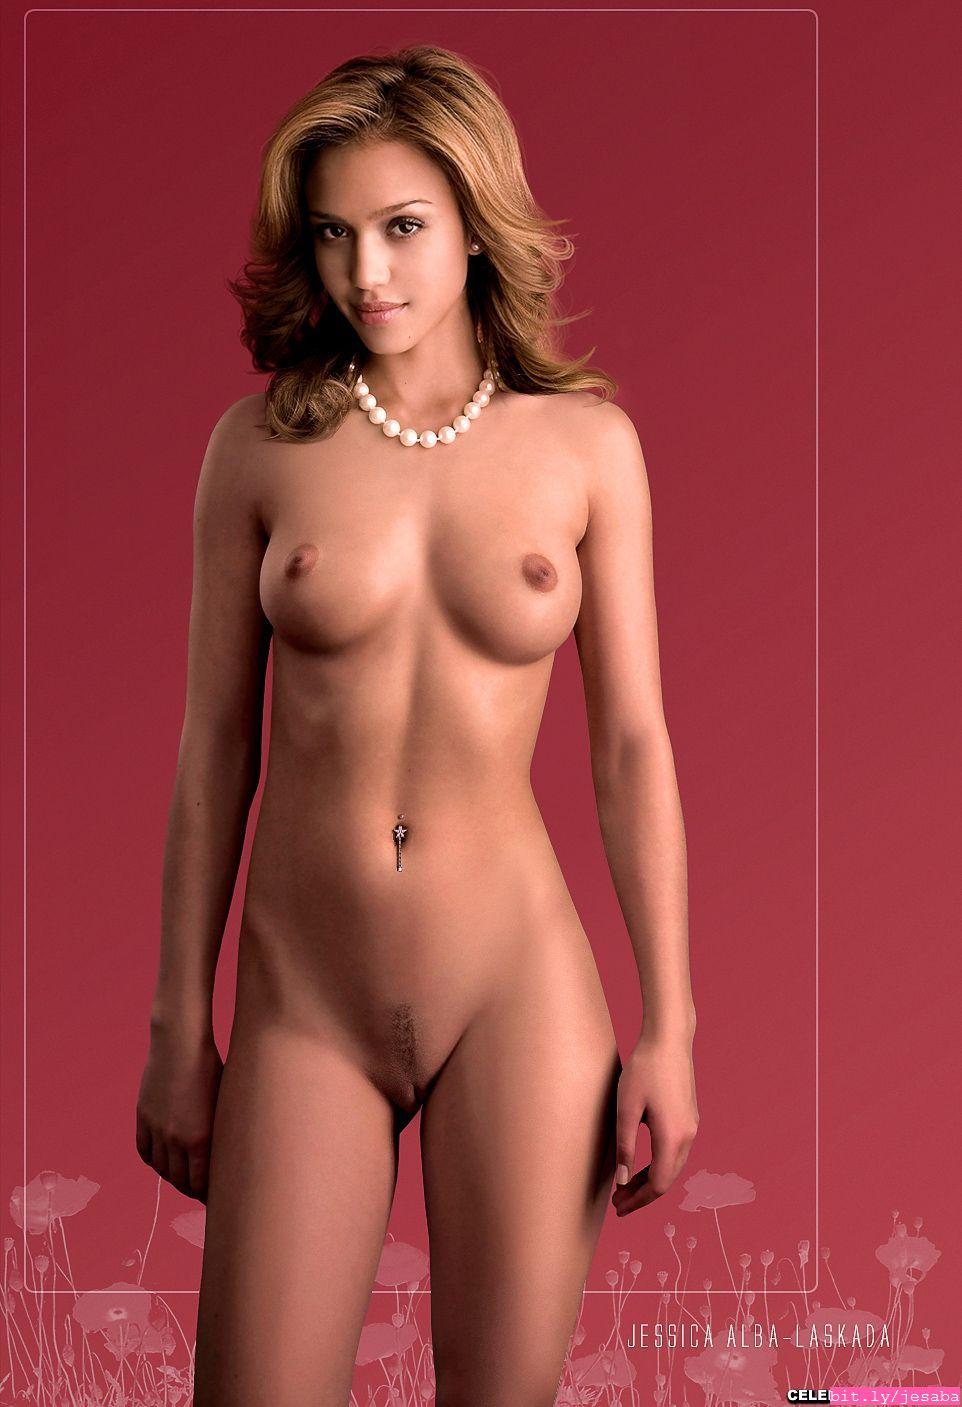 ebony models topless